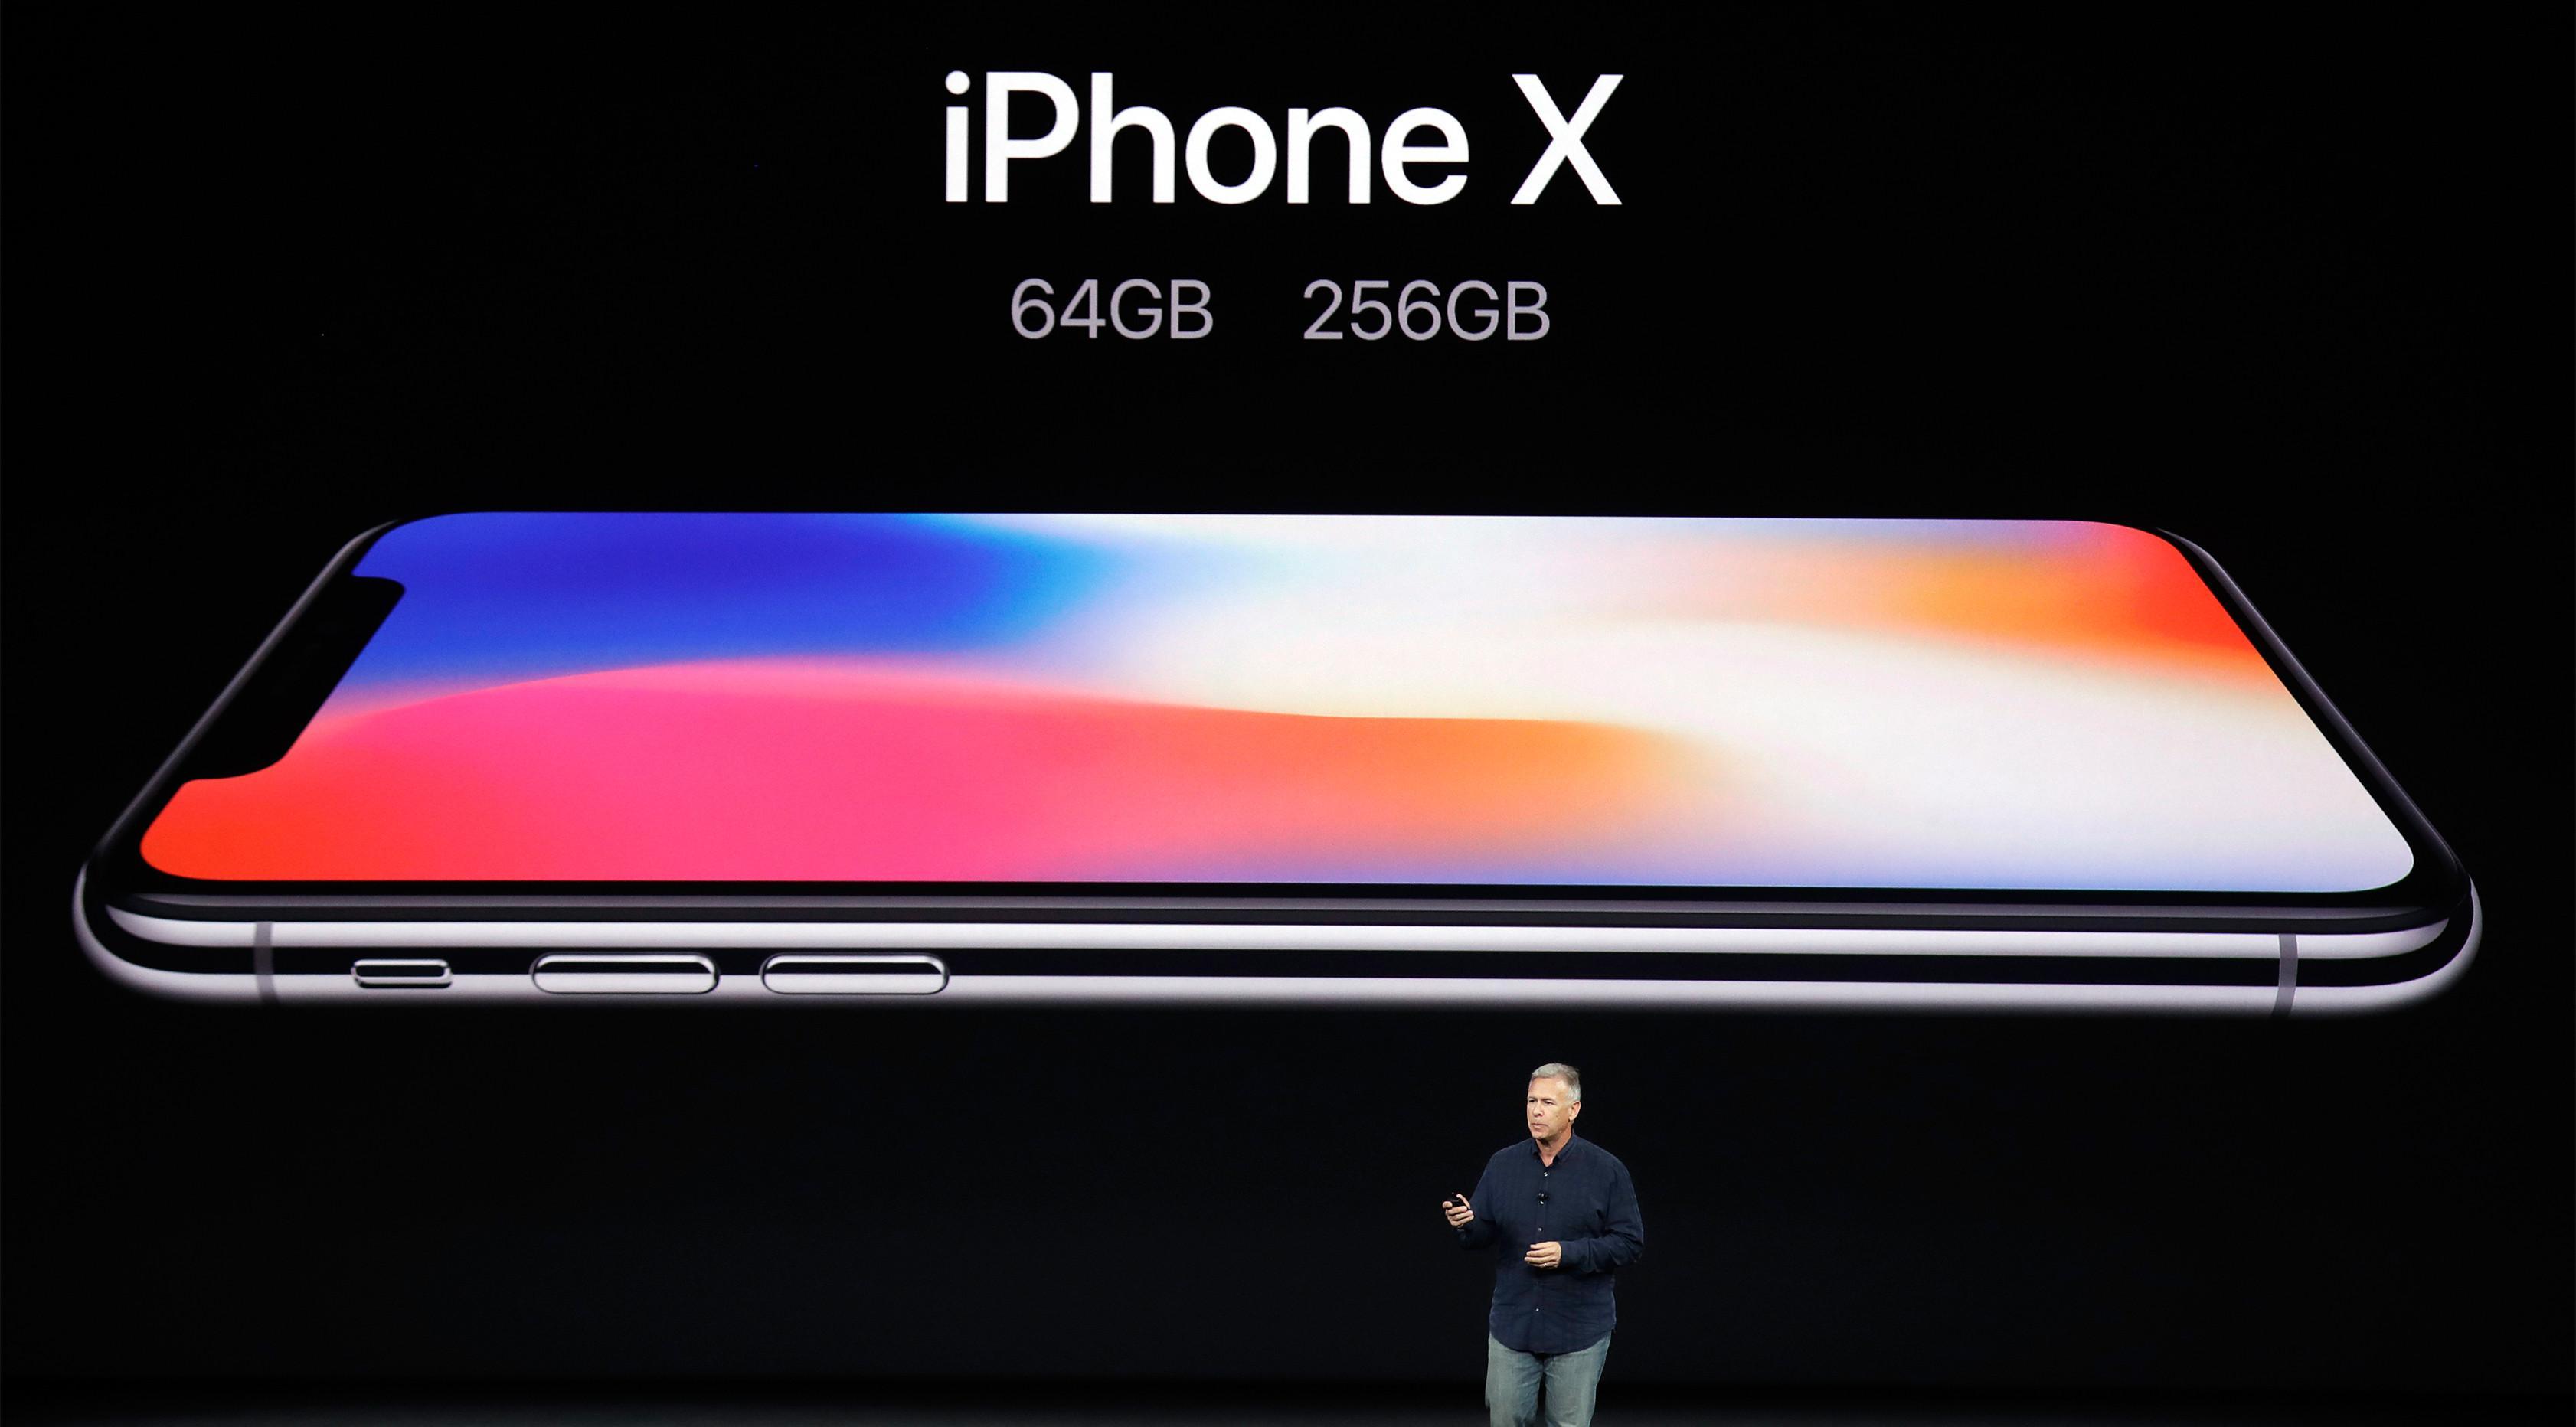 PHOTO: Harga yang Wow, Apple Kenalkan Kecanggihan iPhone X